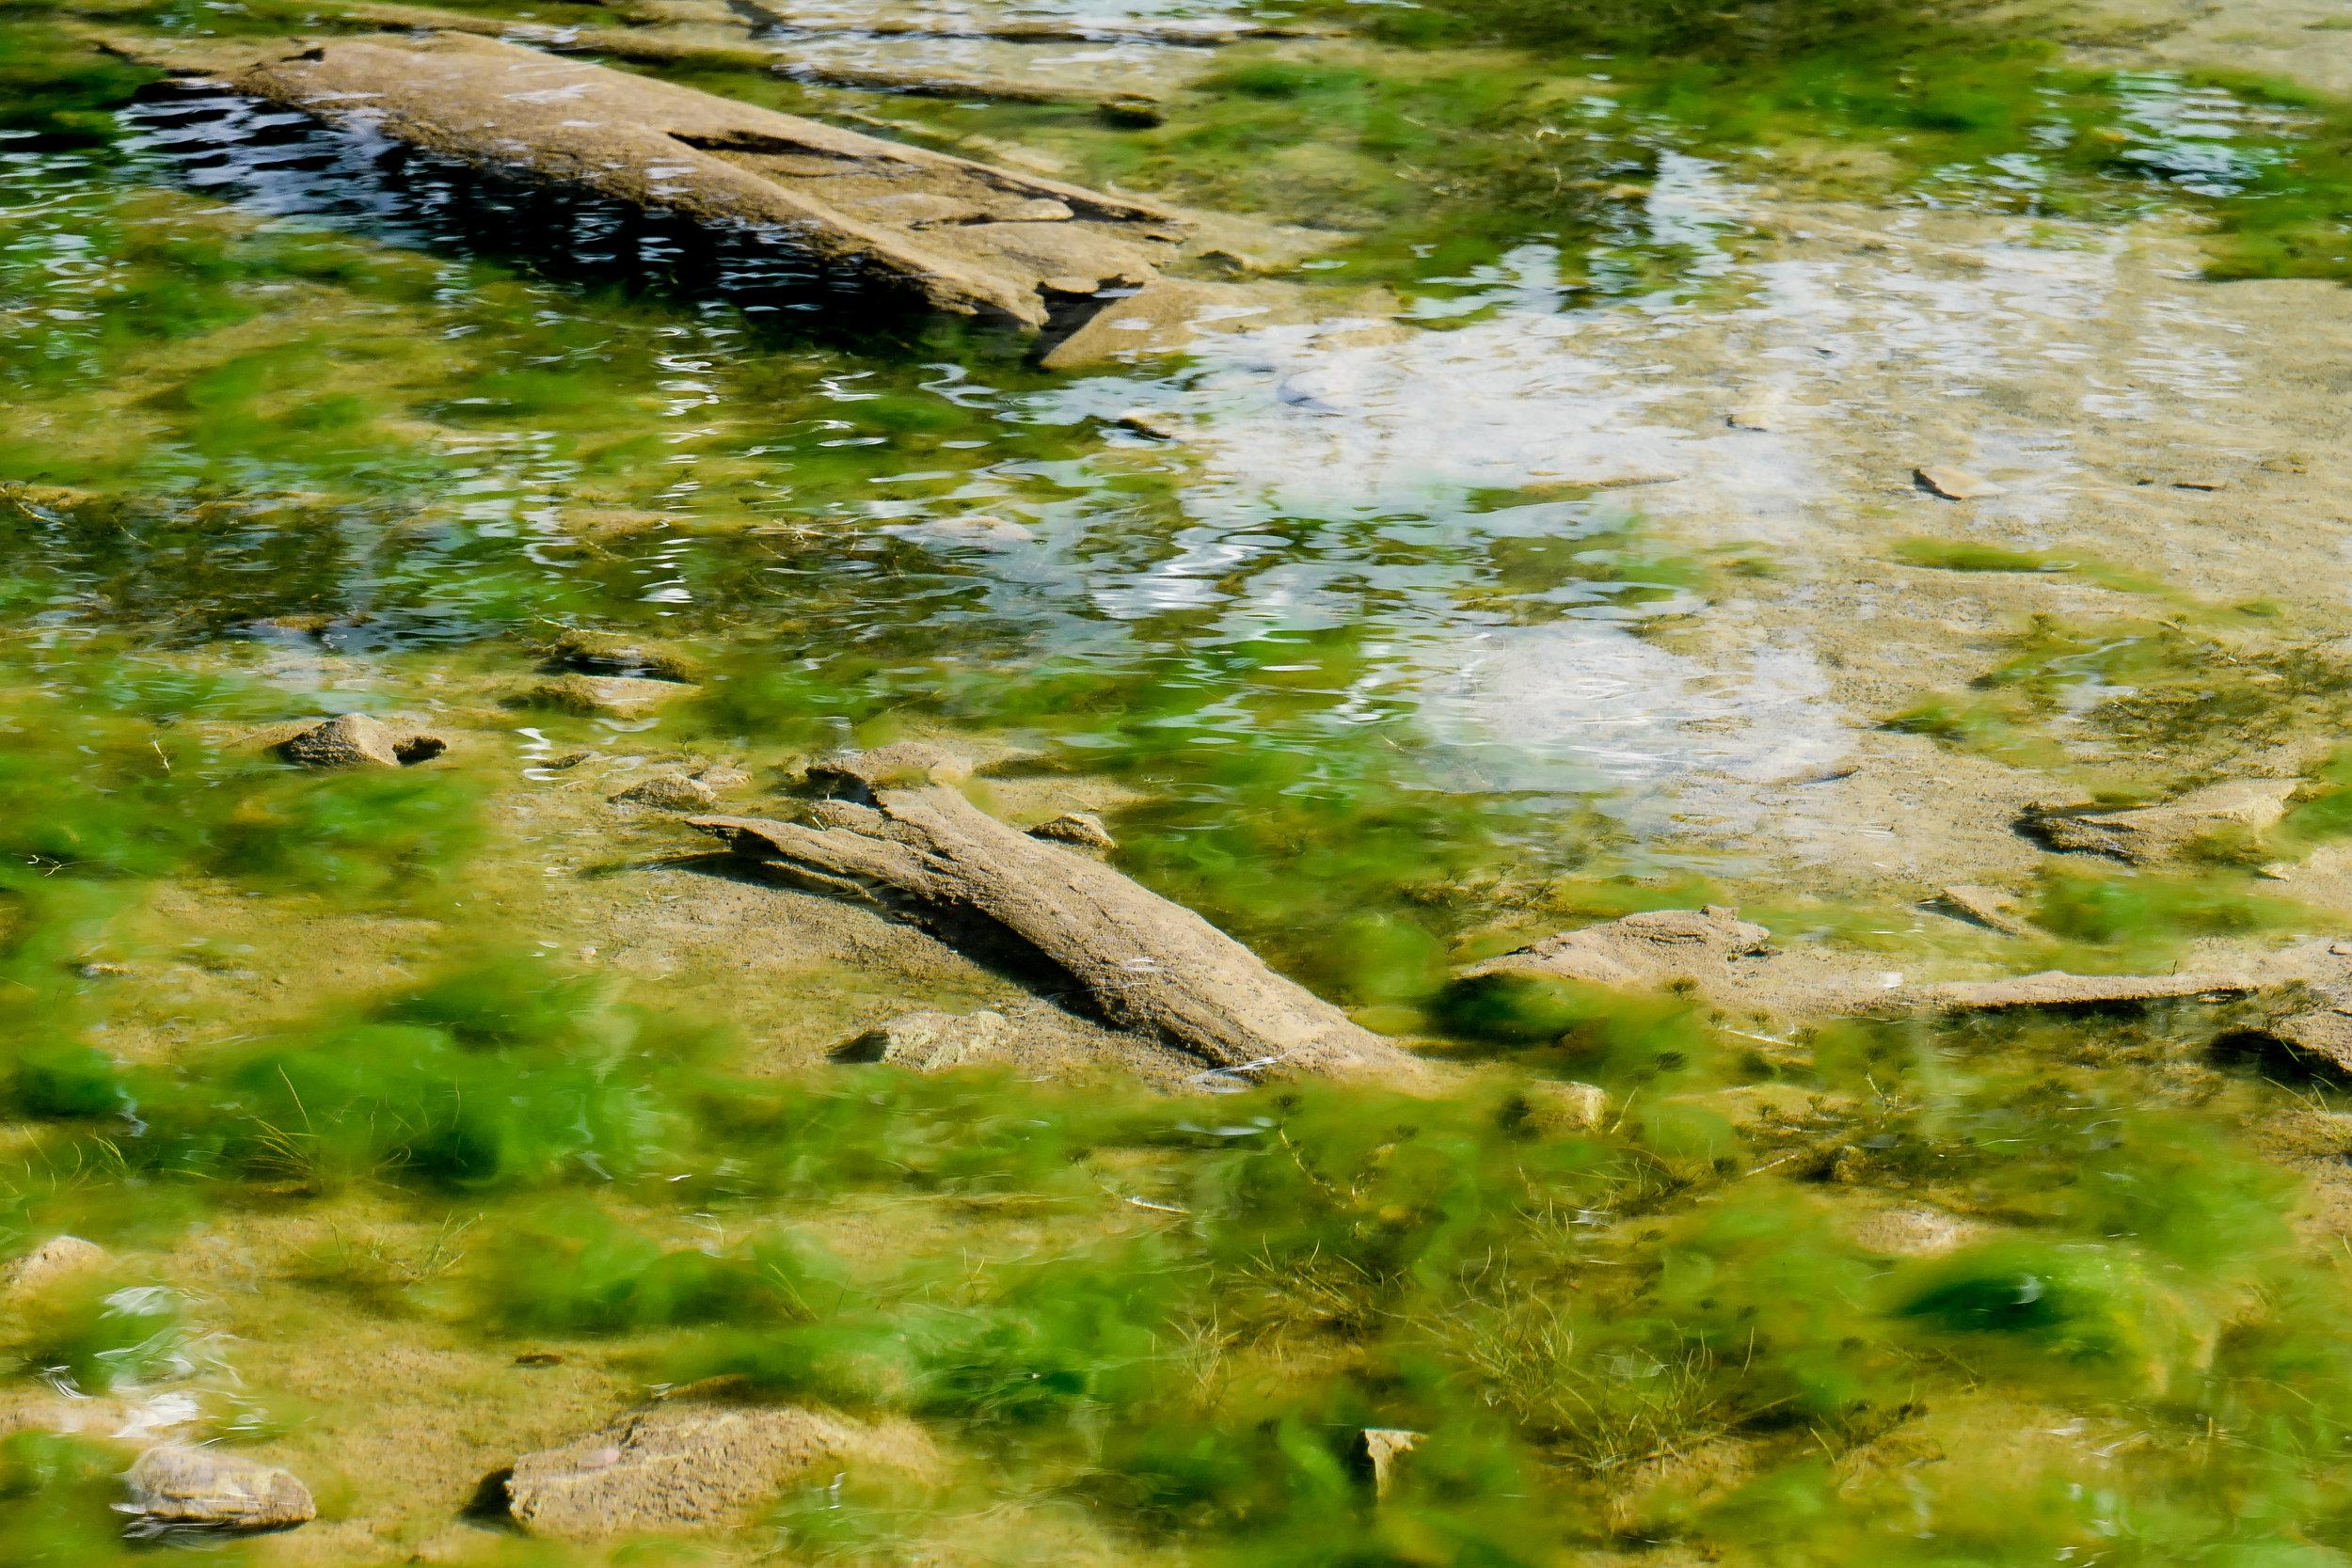 Submerged Limb #2